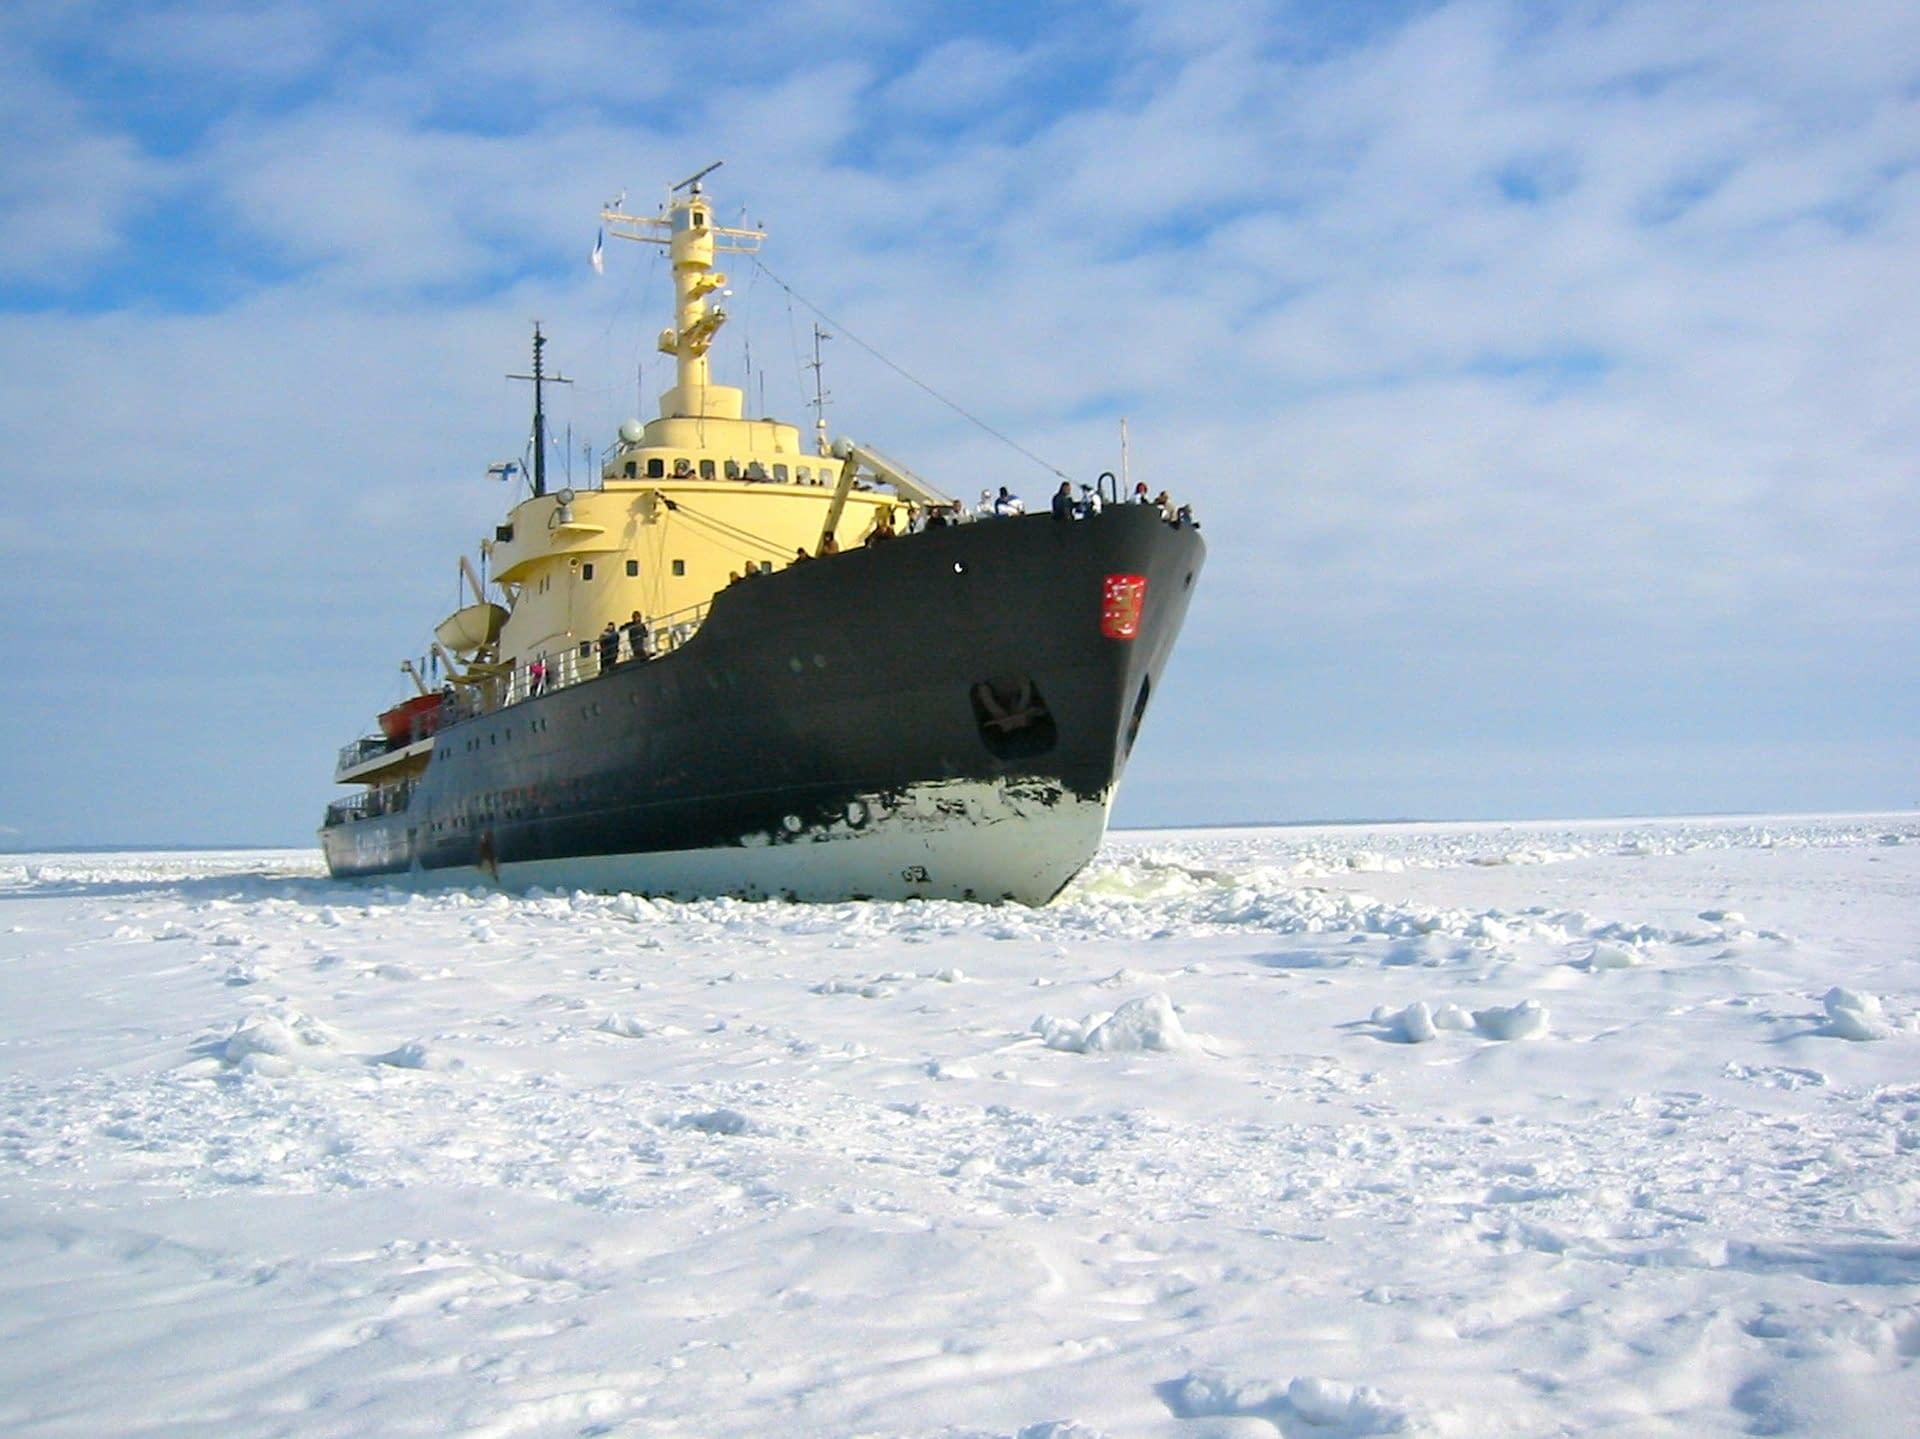 icebreaker-138924_1920